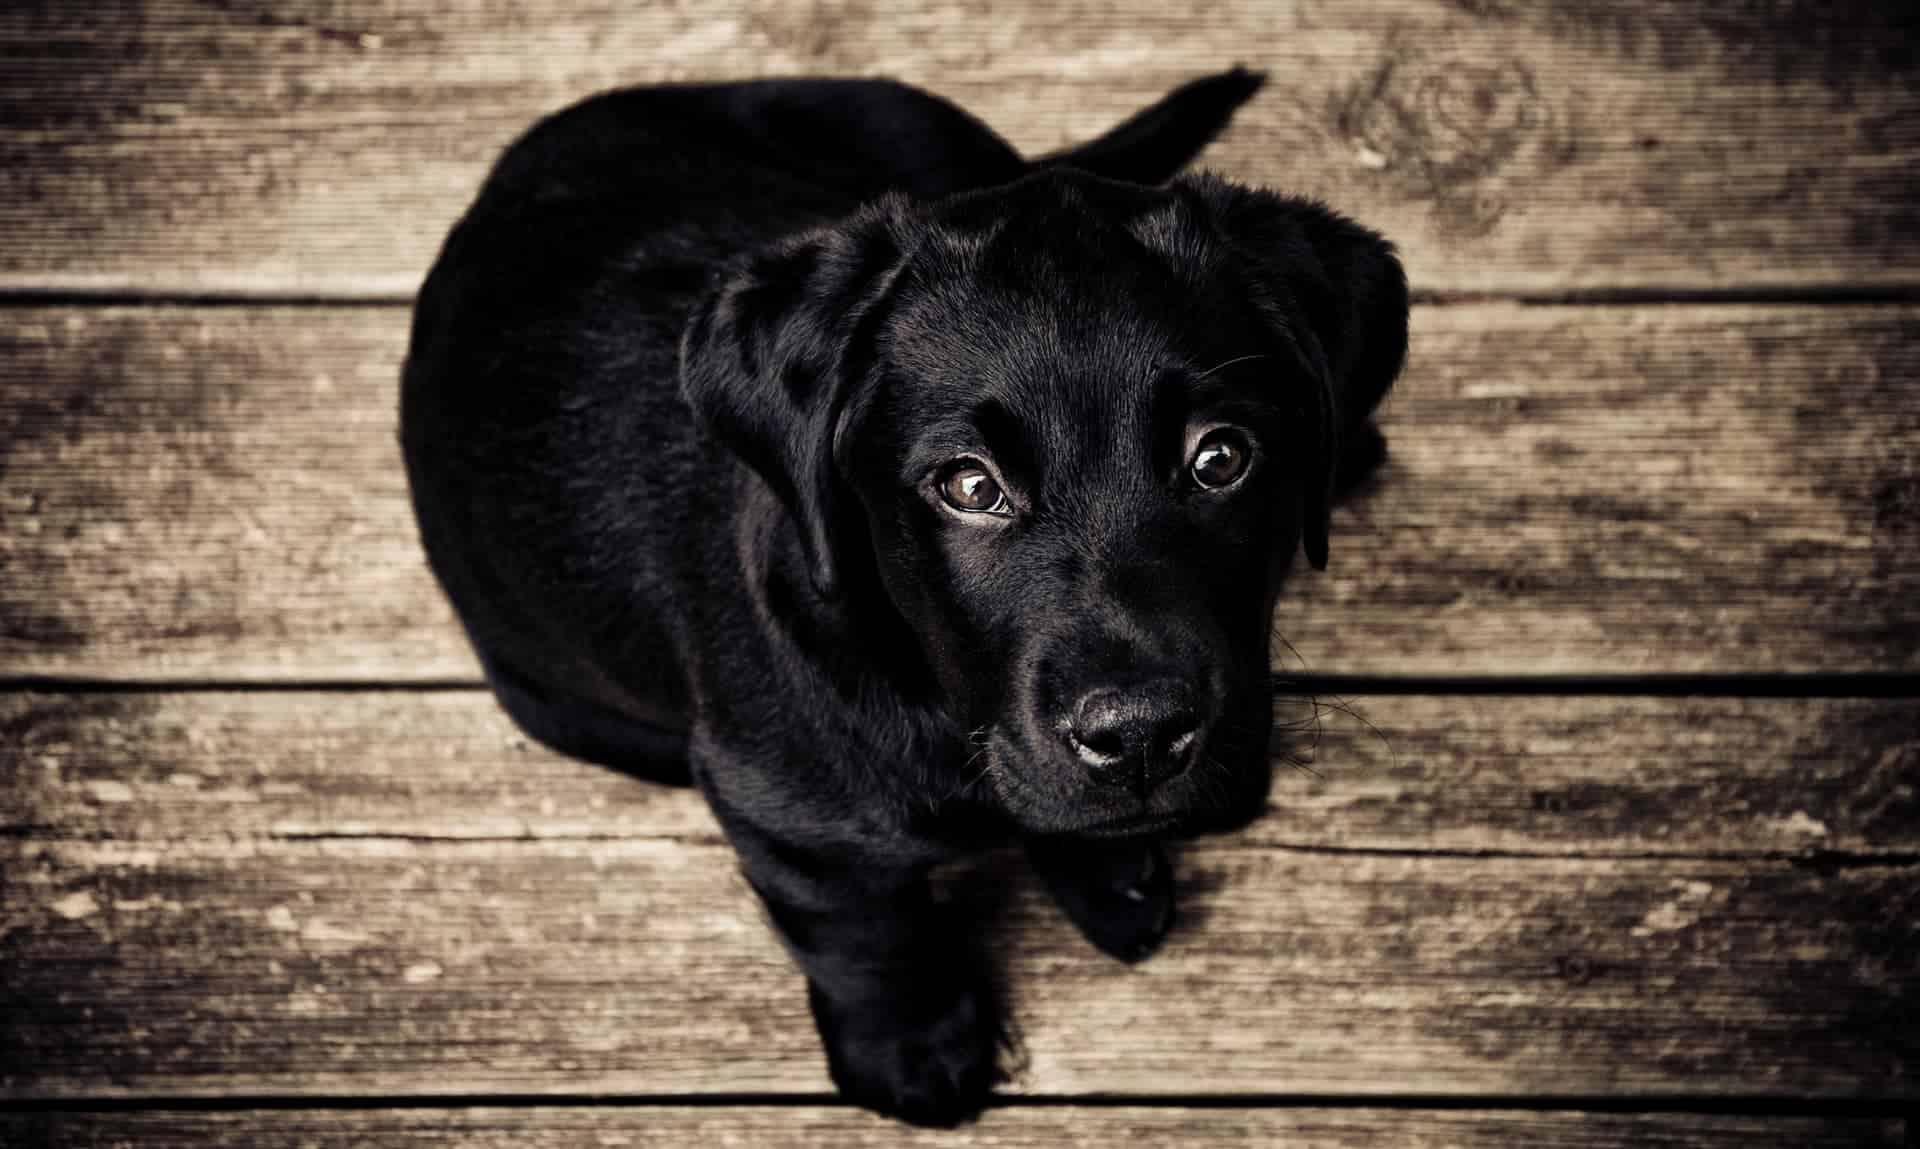 Shocked TV Anchor Bitten by Dog